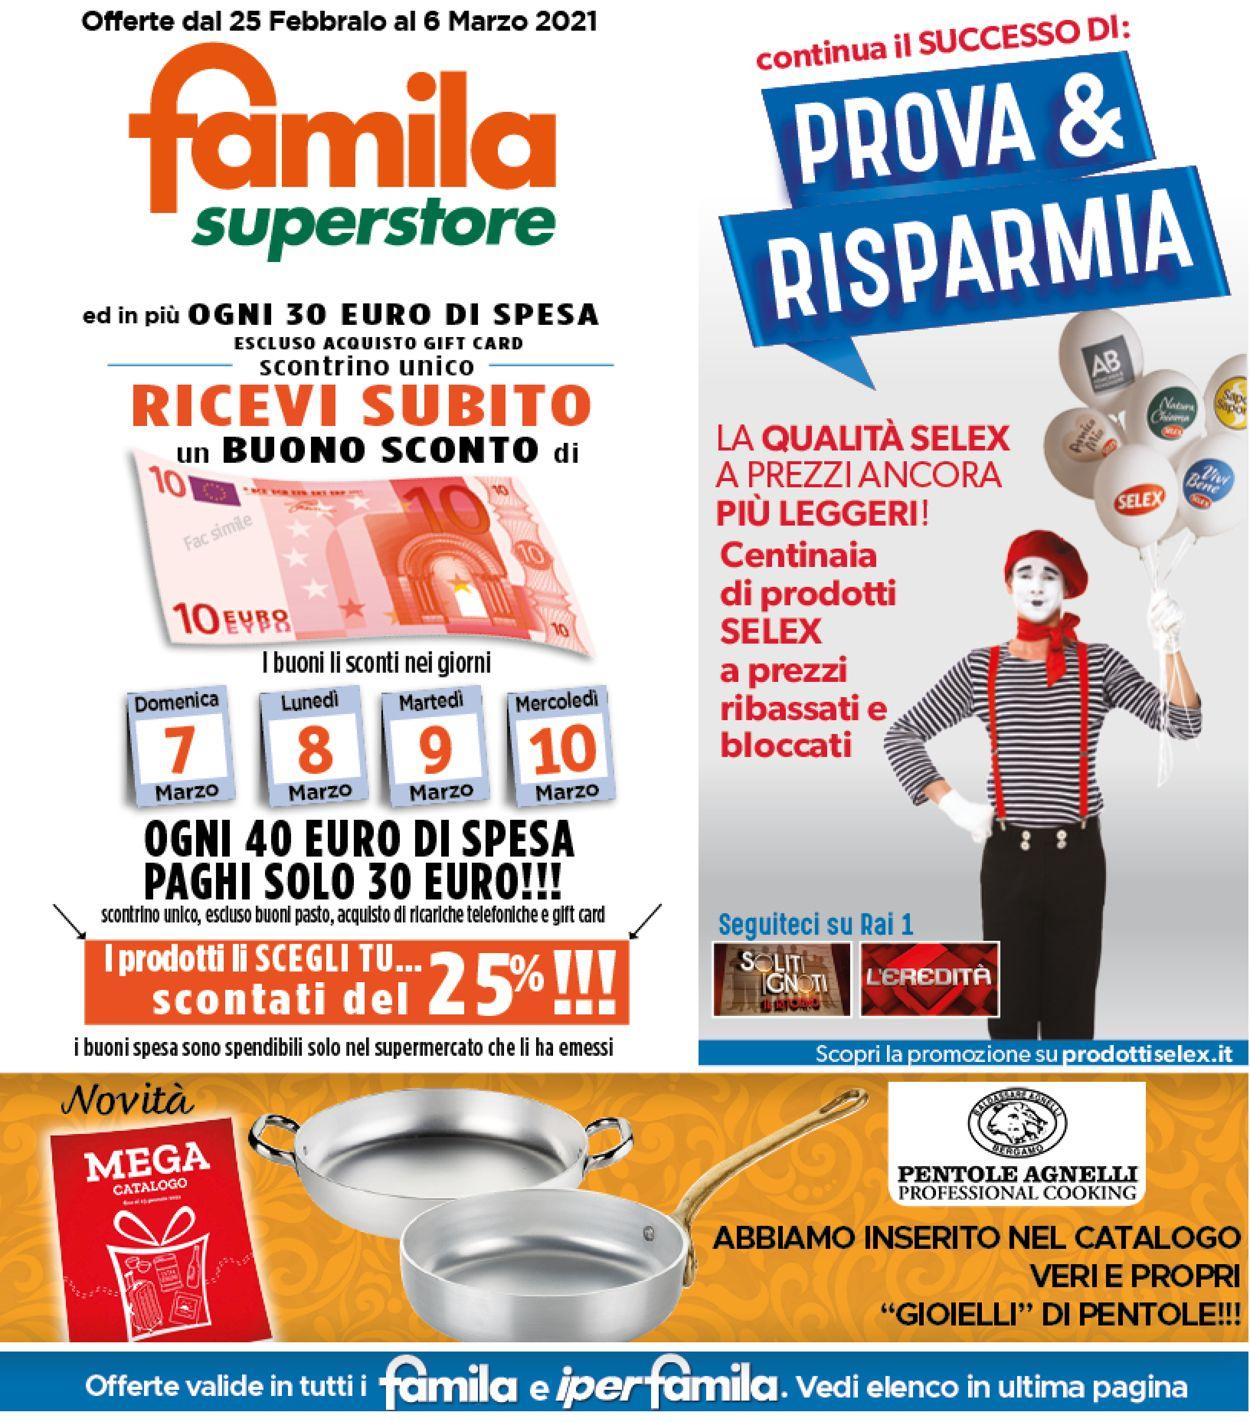 Volantino Famila - Offerte 25/02-06/03/2021